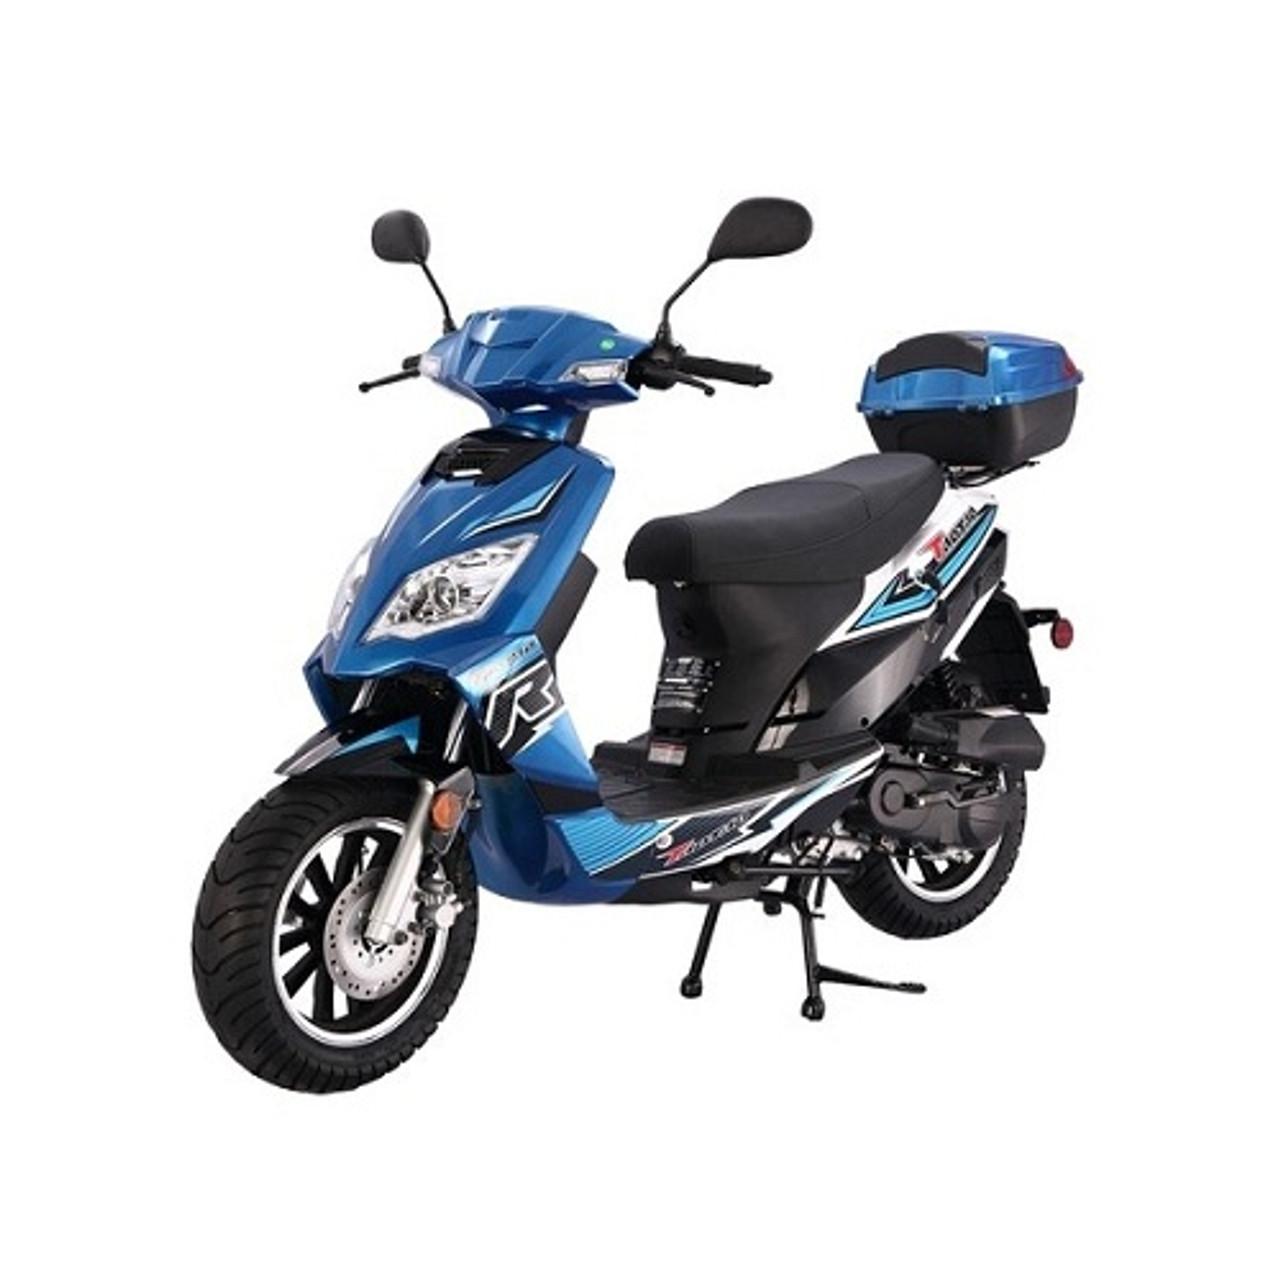 new scooter 50cc assembled [ 1280 x 1280 Pixel ]